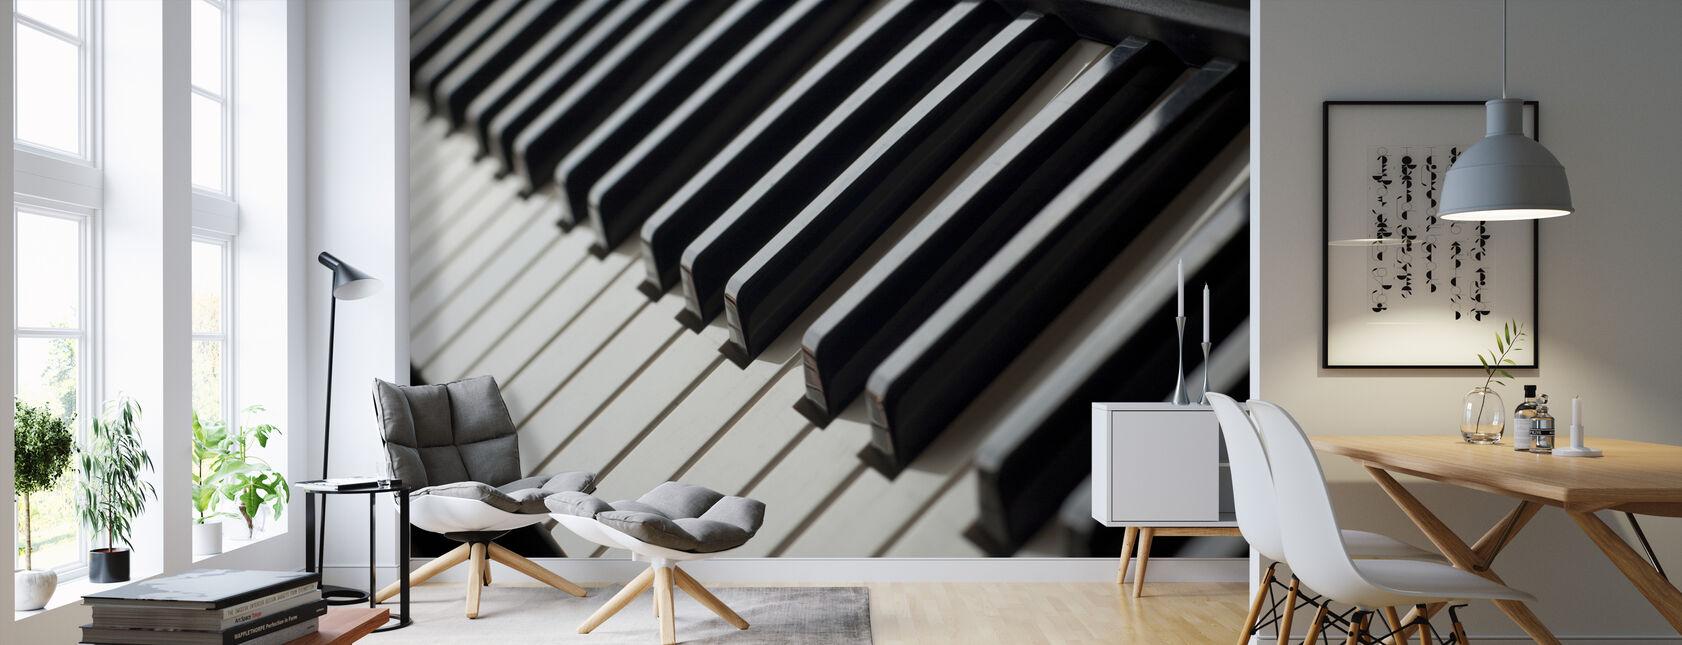 Piano Tangentbord - Tapet - Vardagsrum